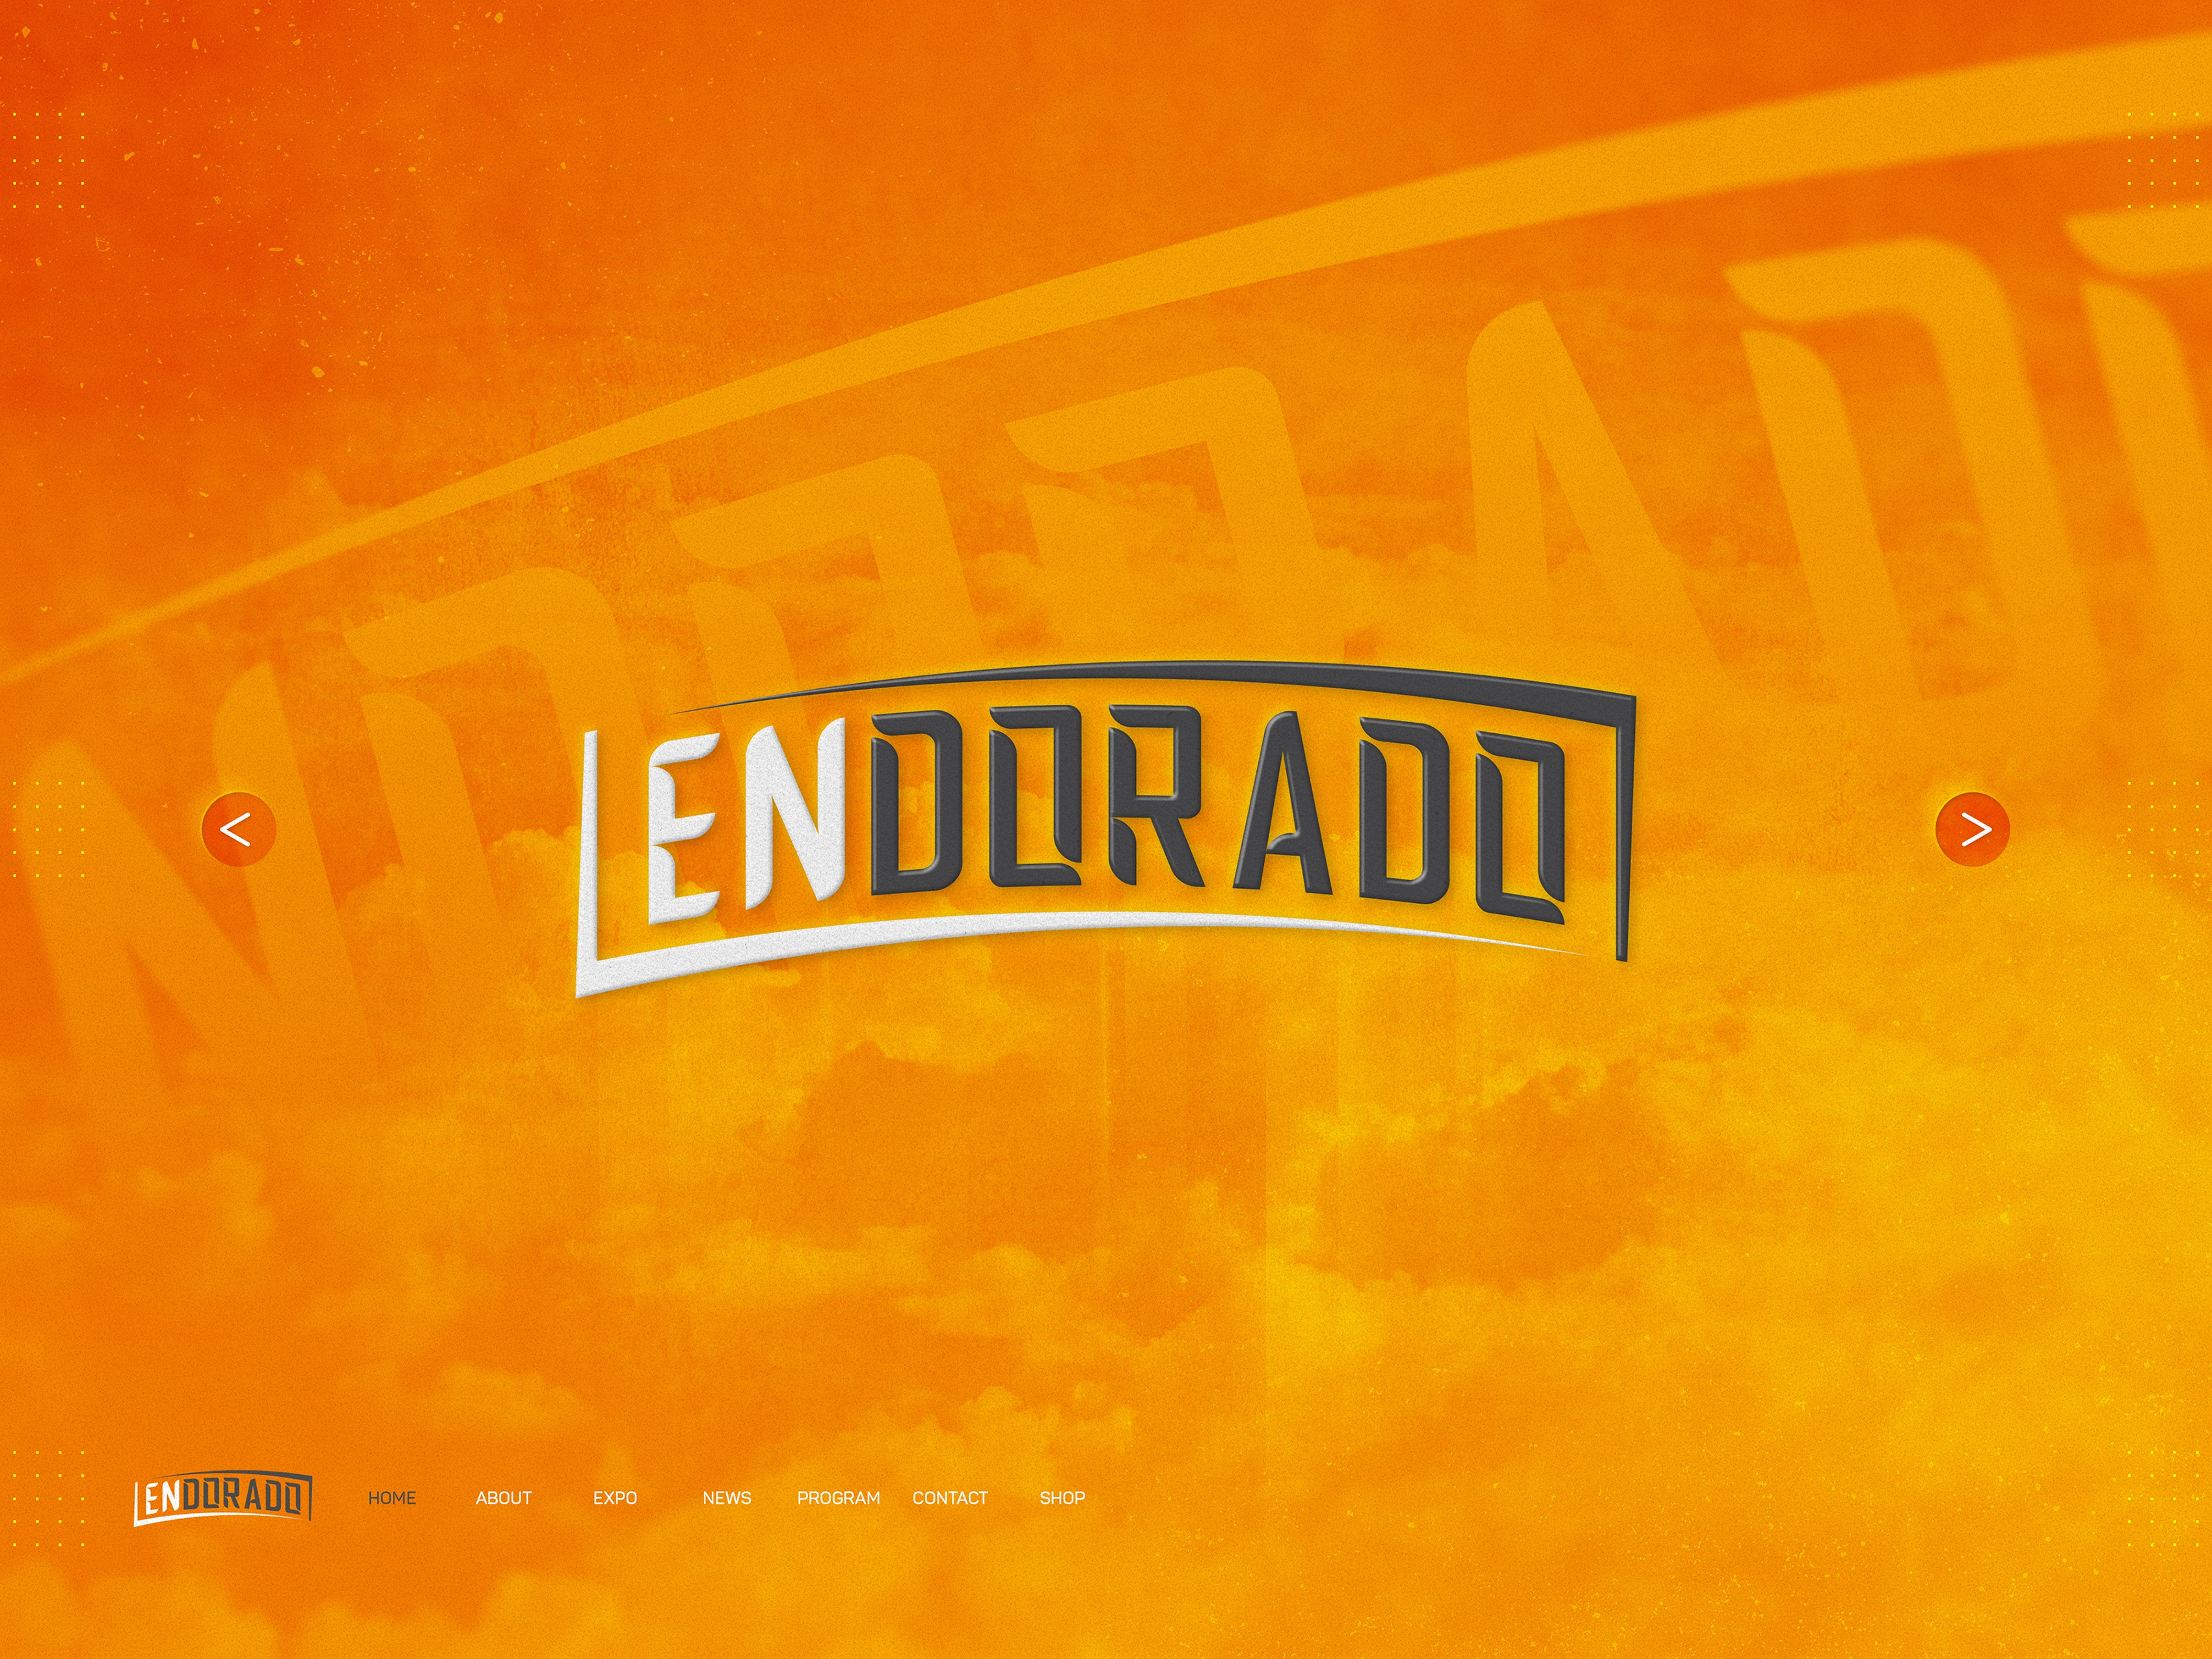 Endorado    logotype concept design v.1.1 3400x2550